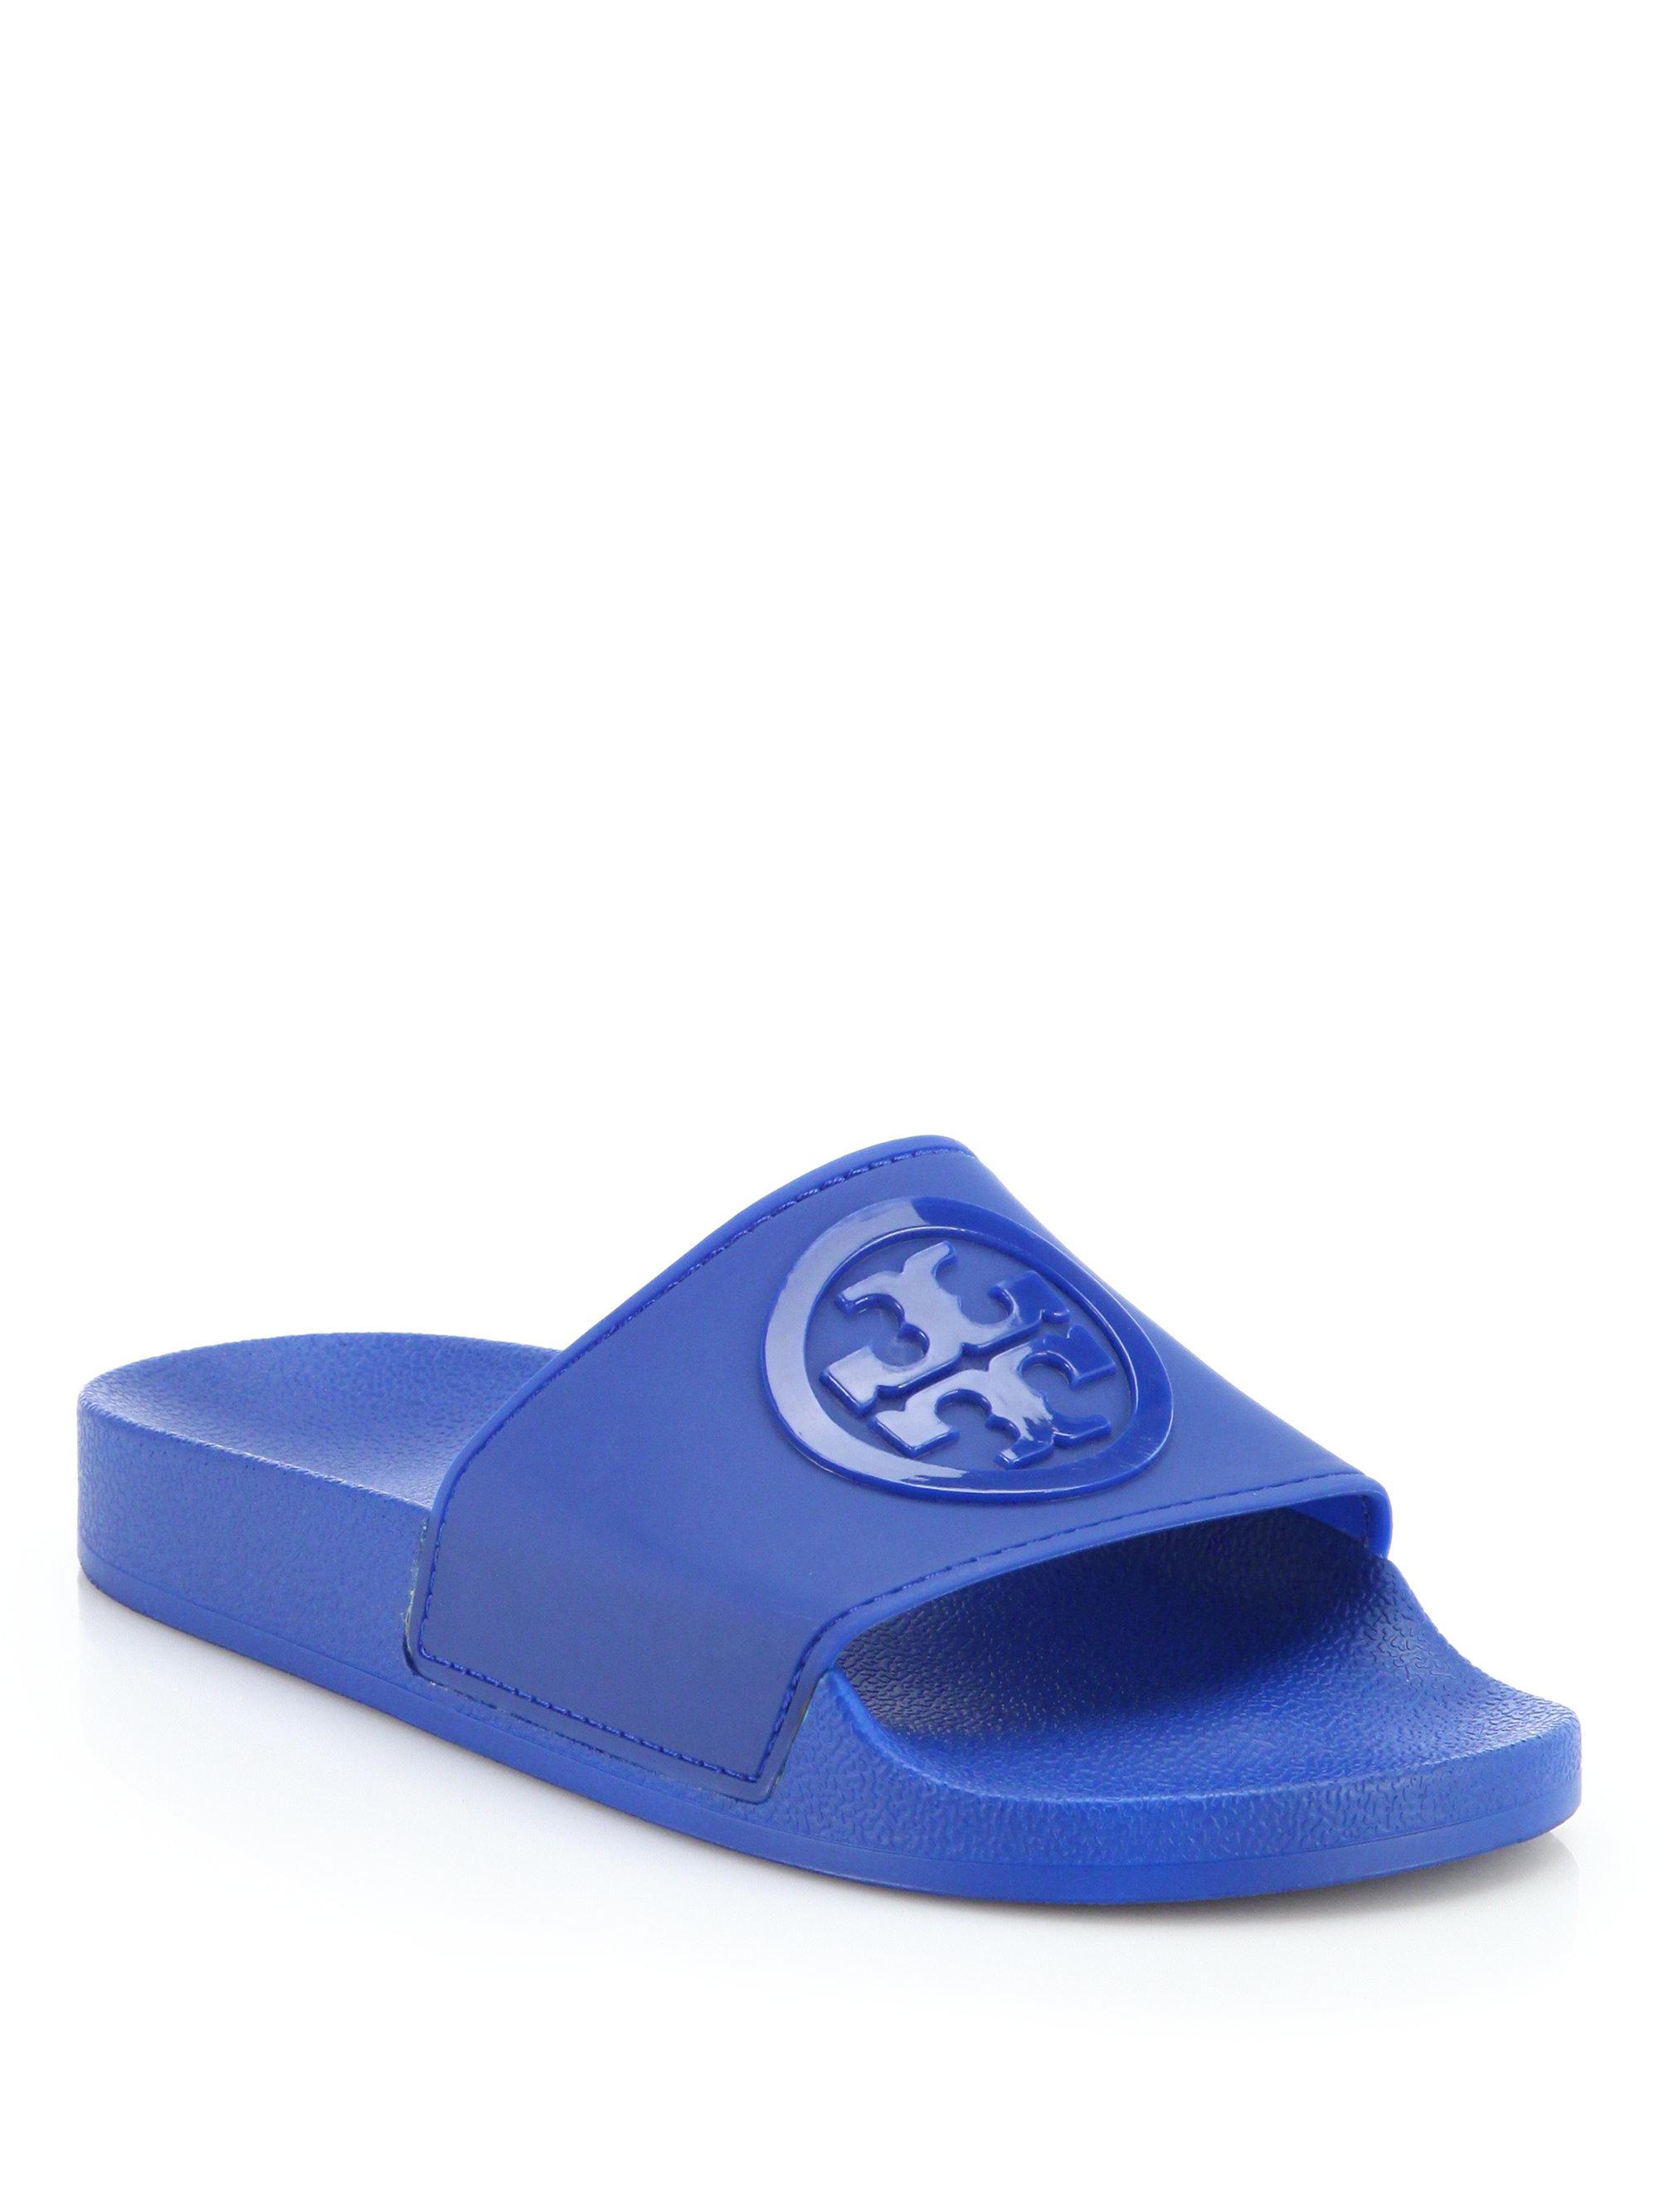 2bd4375f37b3ce Lyst - Tory Burch Jelly Anatomic Flat Slides in Blue